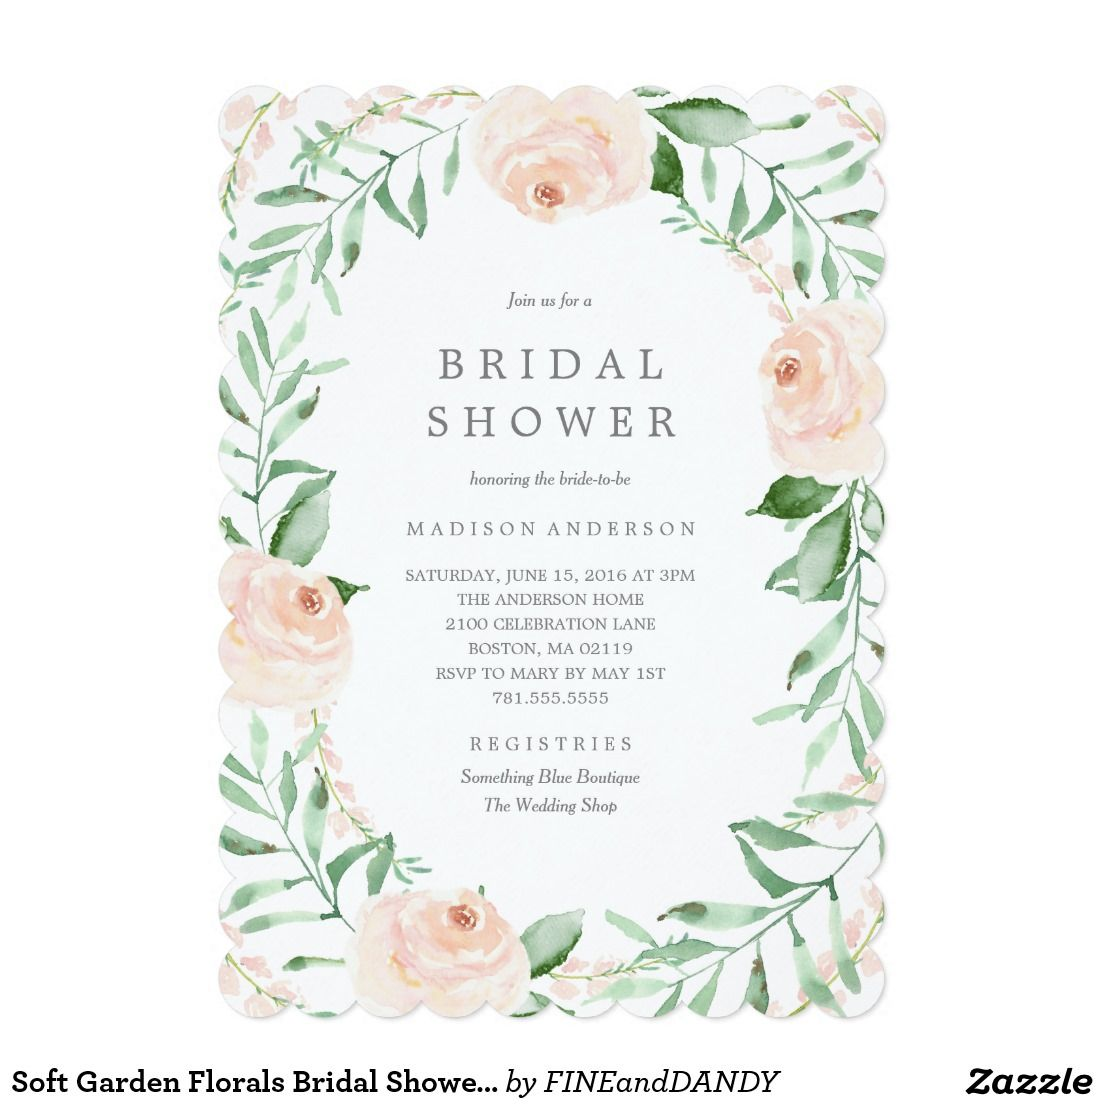 Soft Garden Florals Bridal Shower Invitation   Bridal showers ...